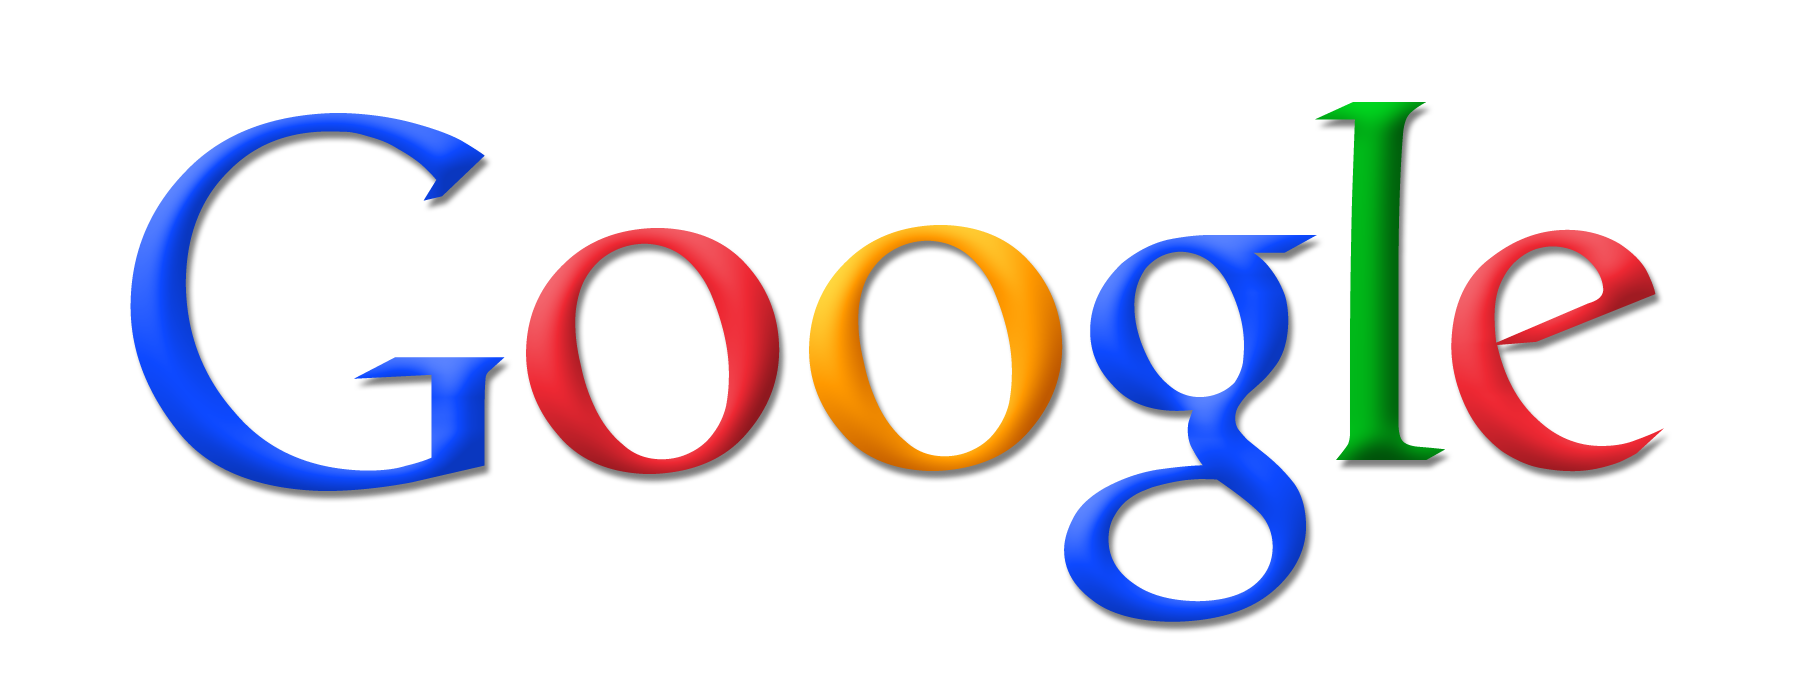 .google